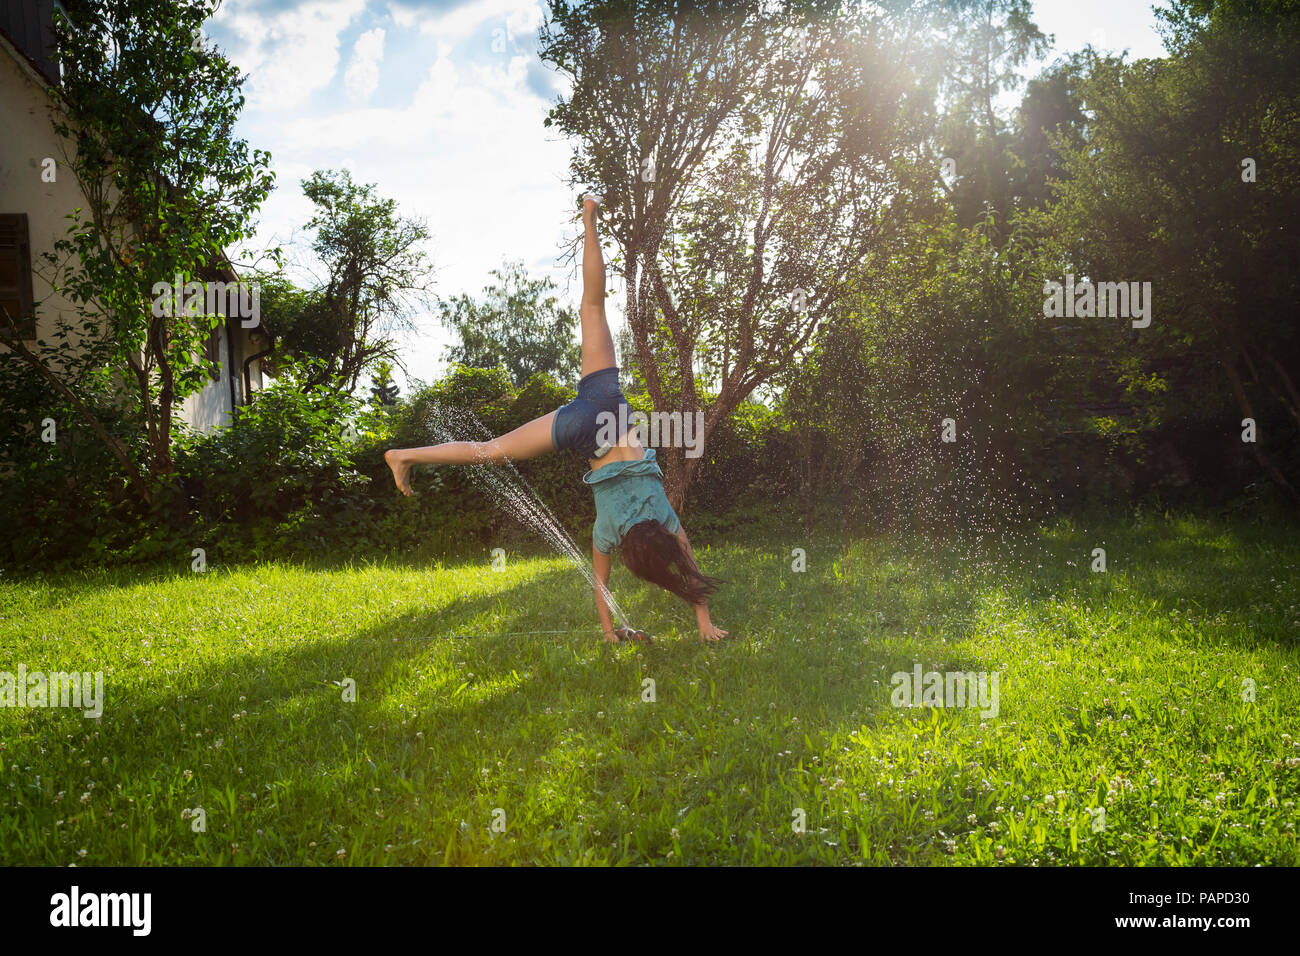 Girl having fun with lawn sprinkler in the garden - Stock Image